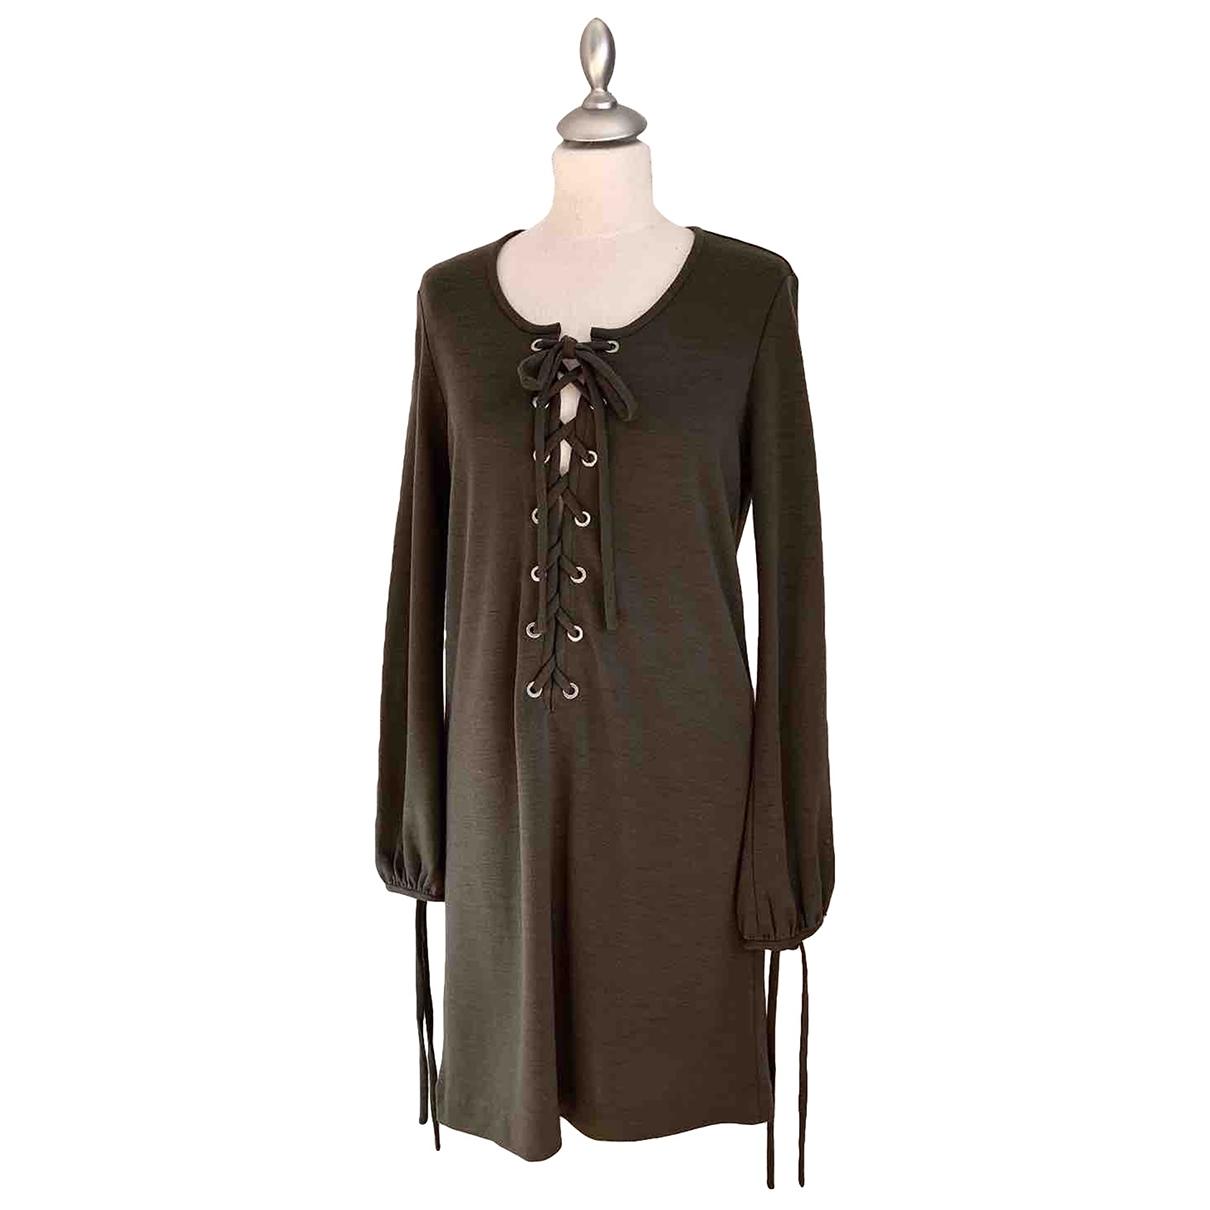 Isabel Marant Etoile \N Kleid in  Khaki Wolle